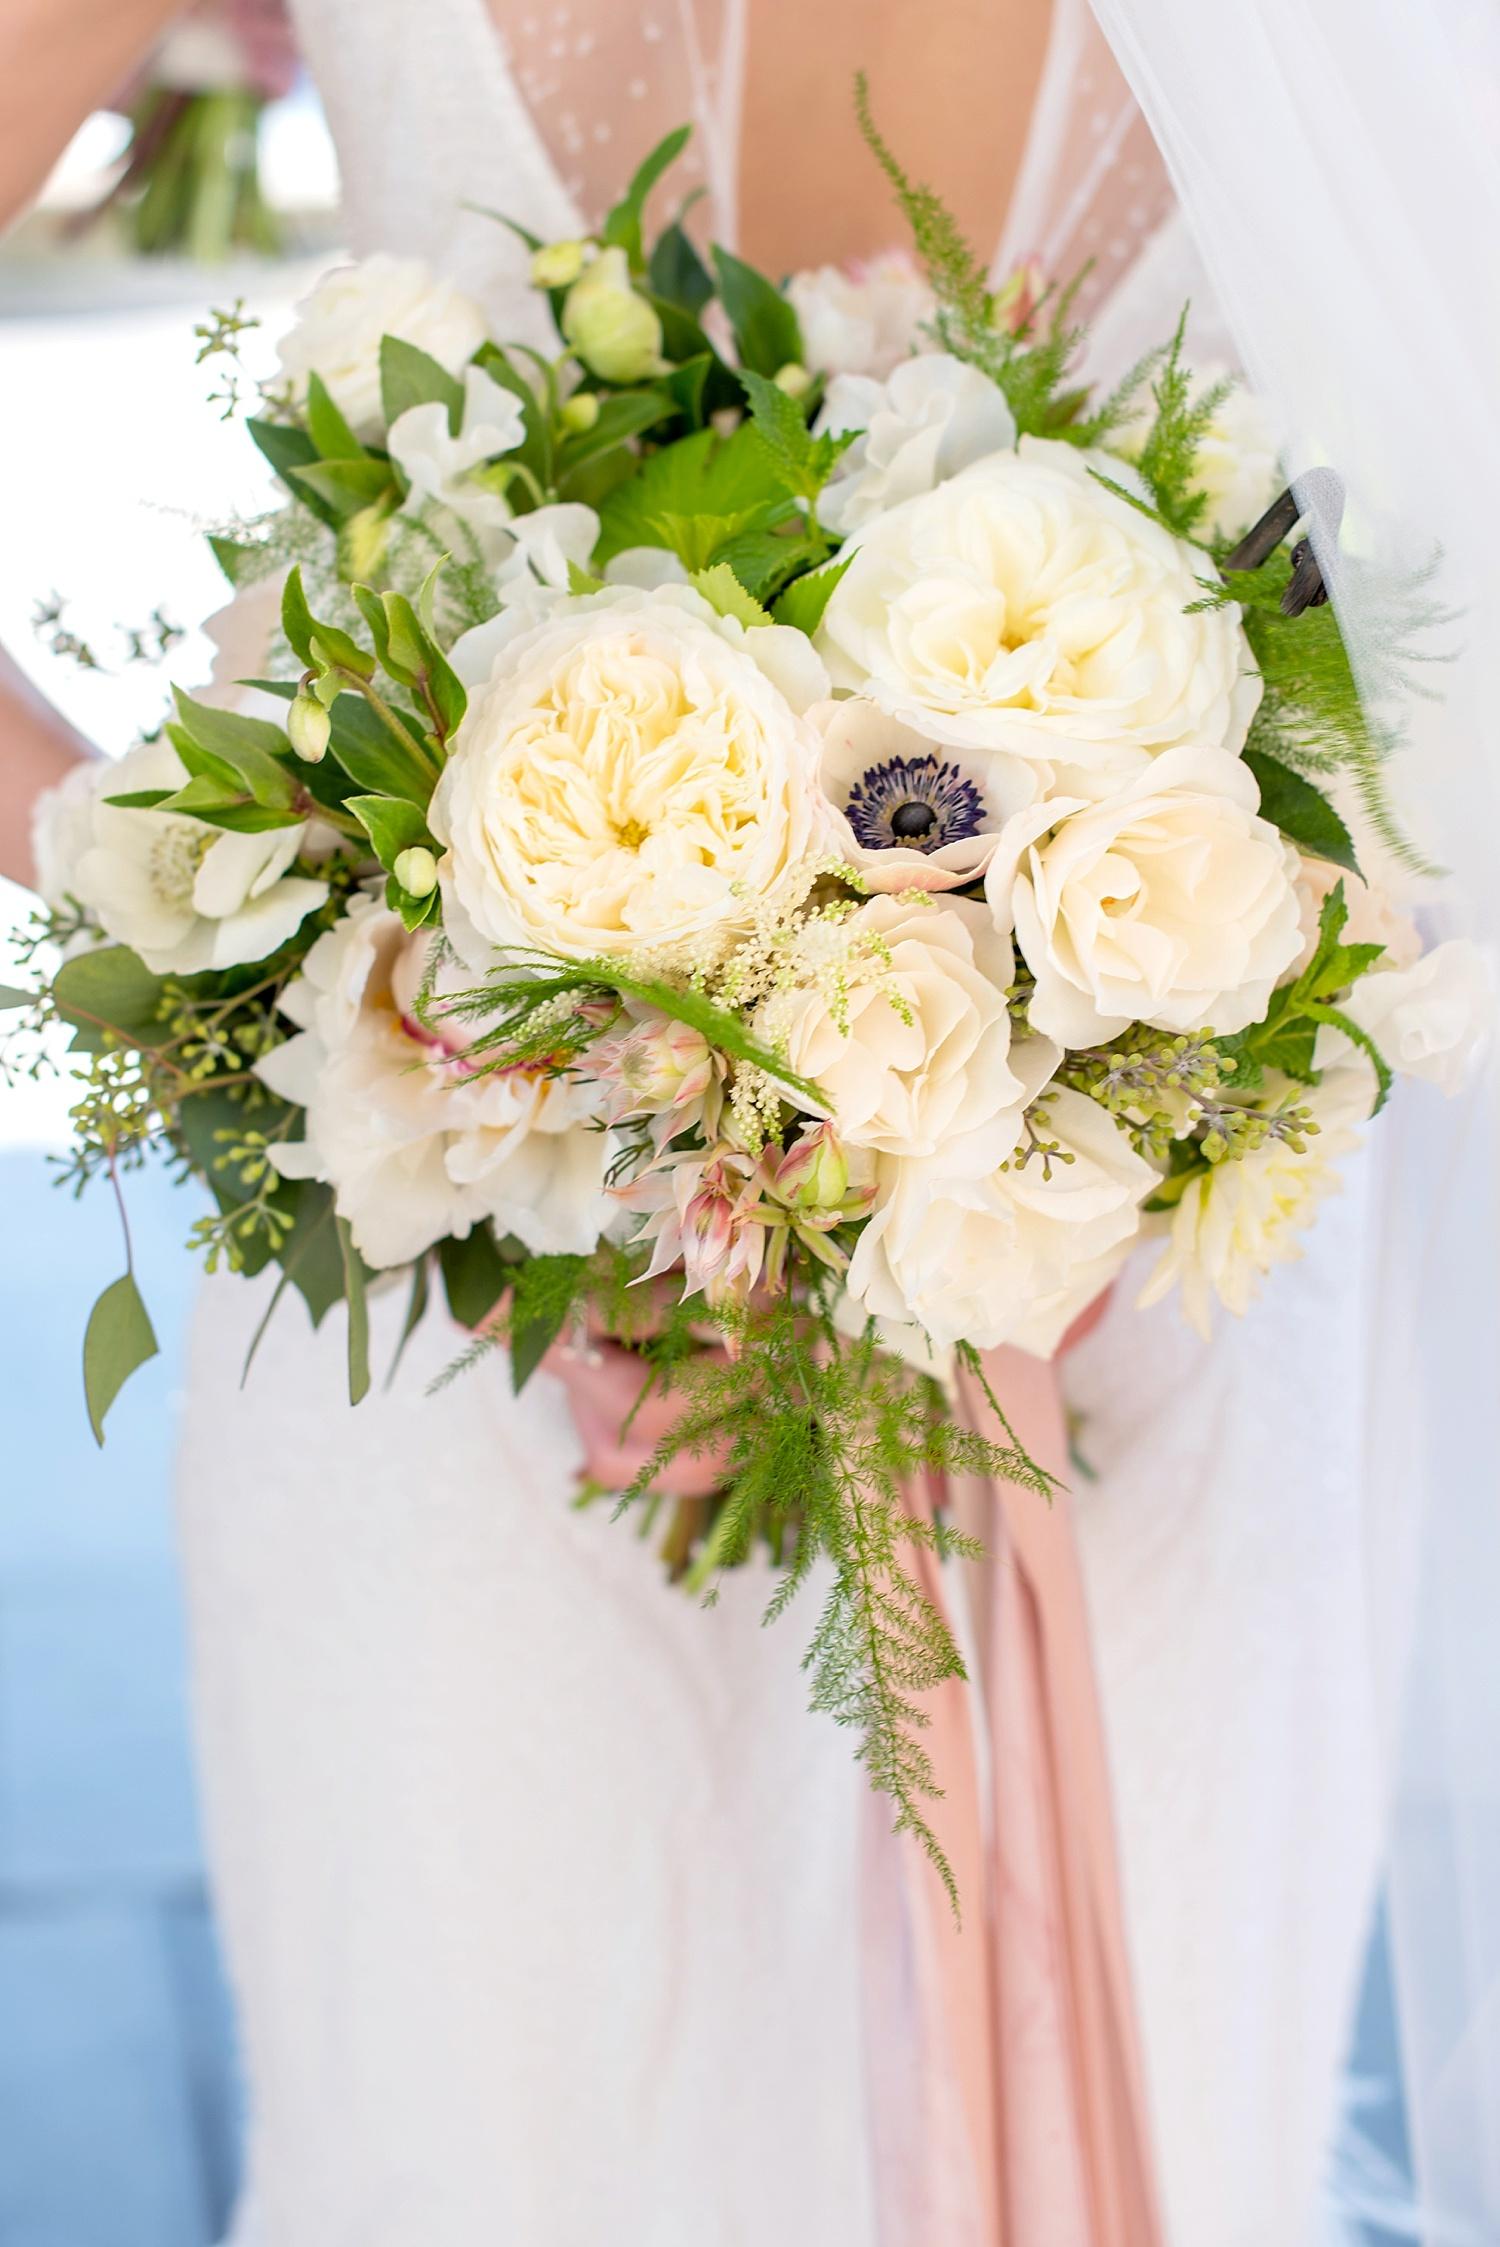 mikkelpaige-full_aperture_floral-pearl_river_hilton_wedding_0010.jpg